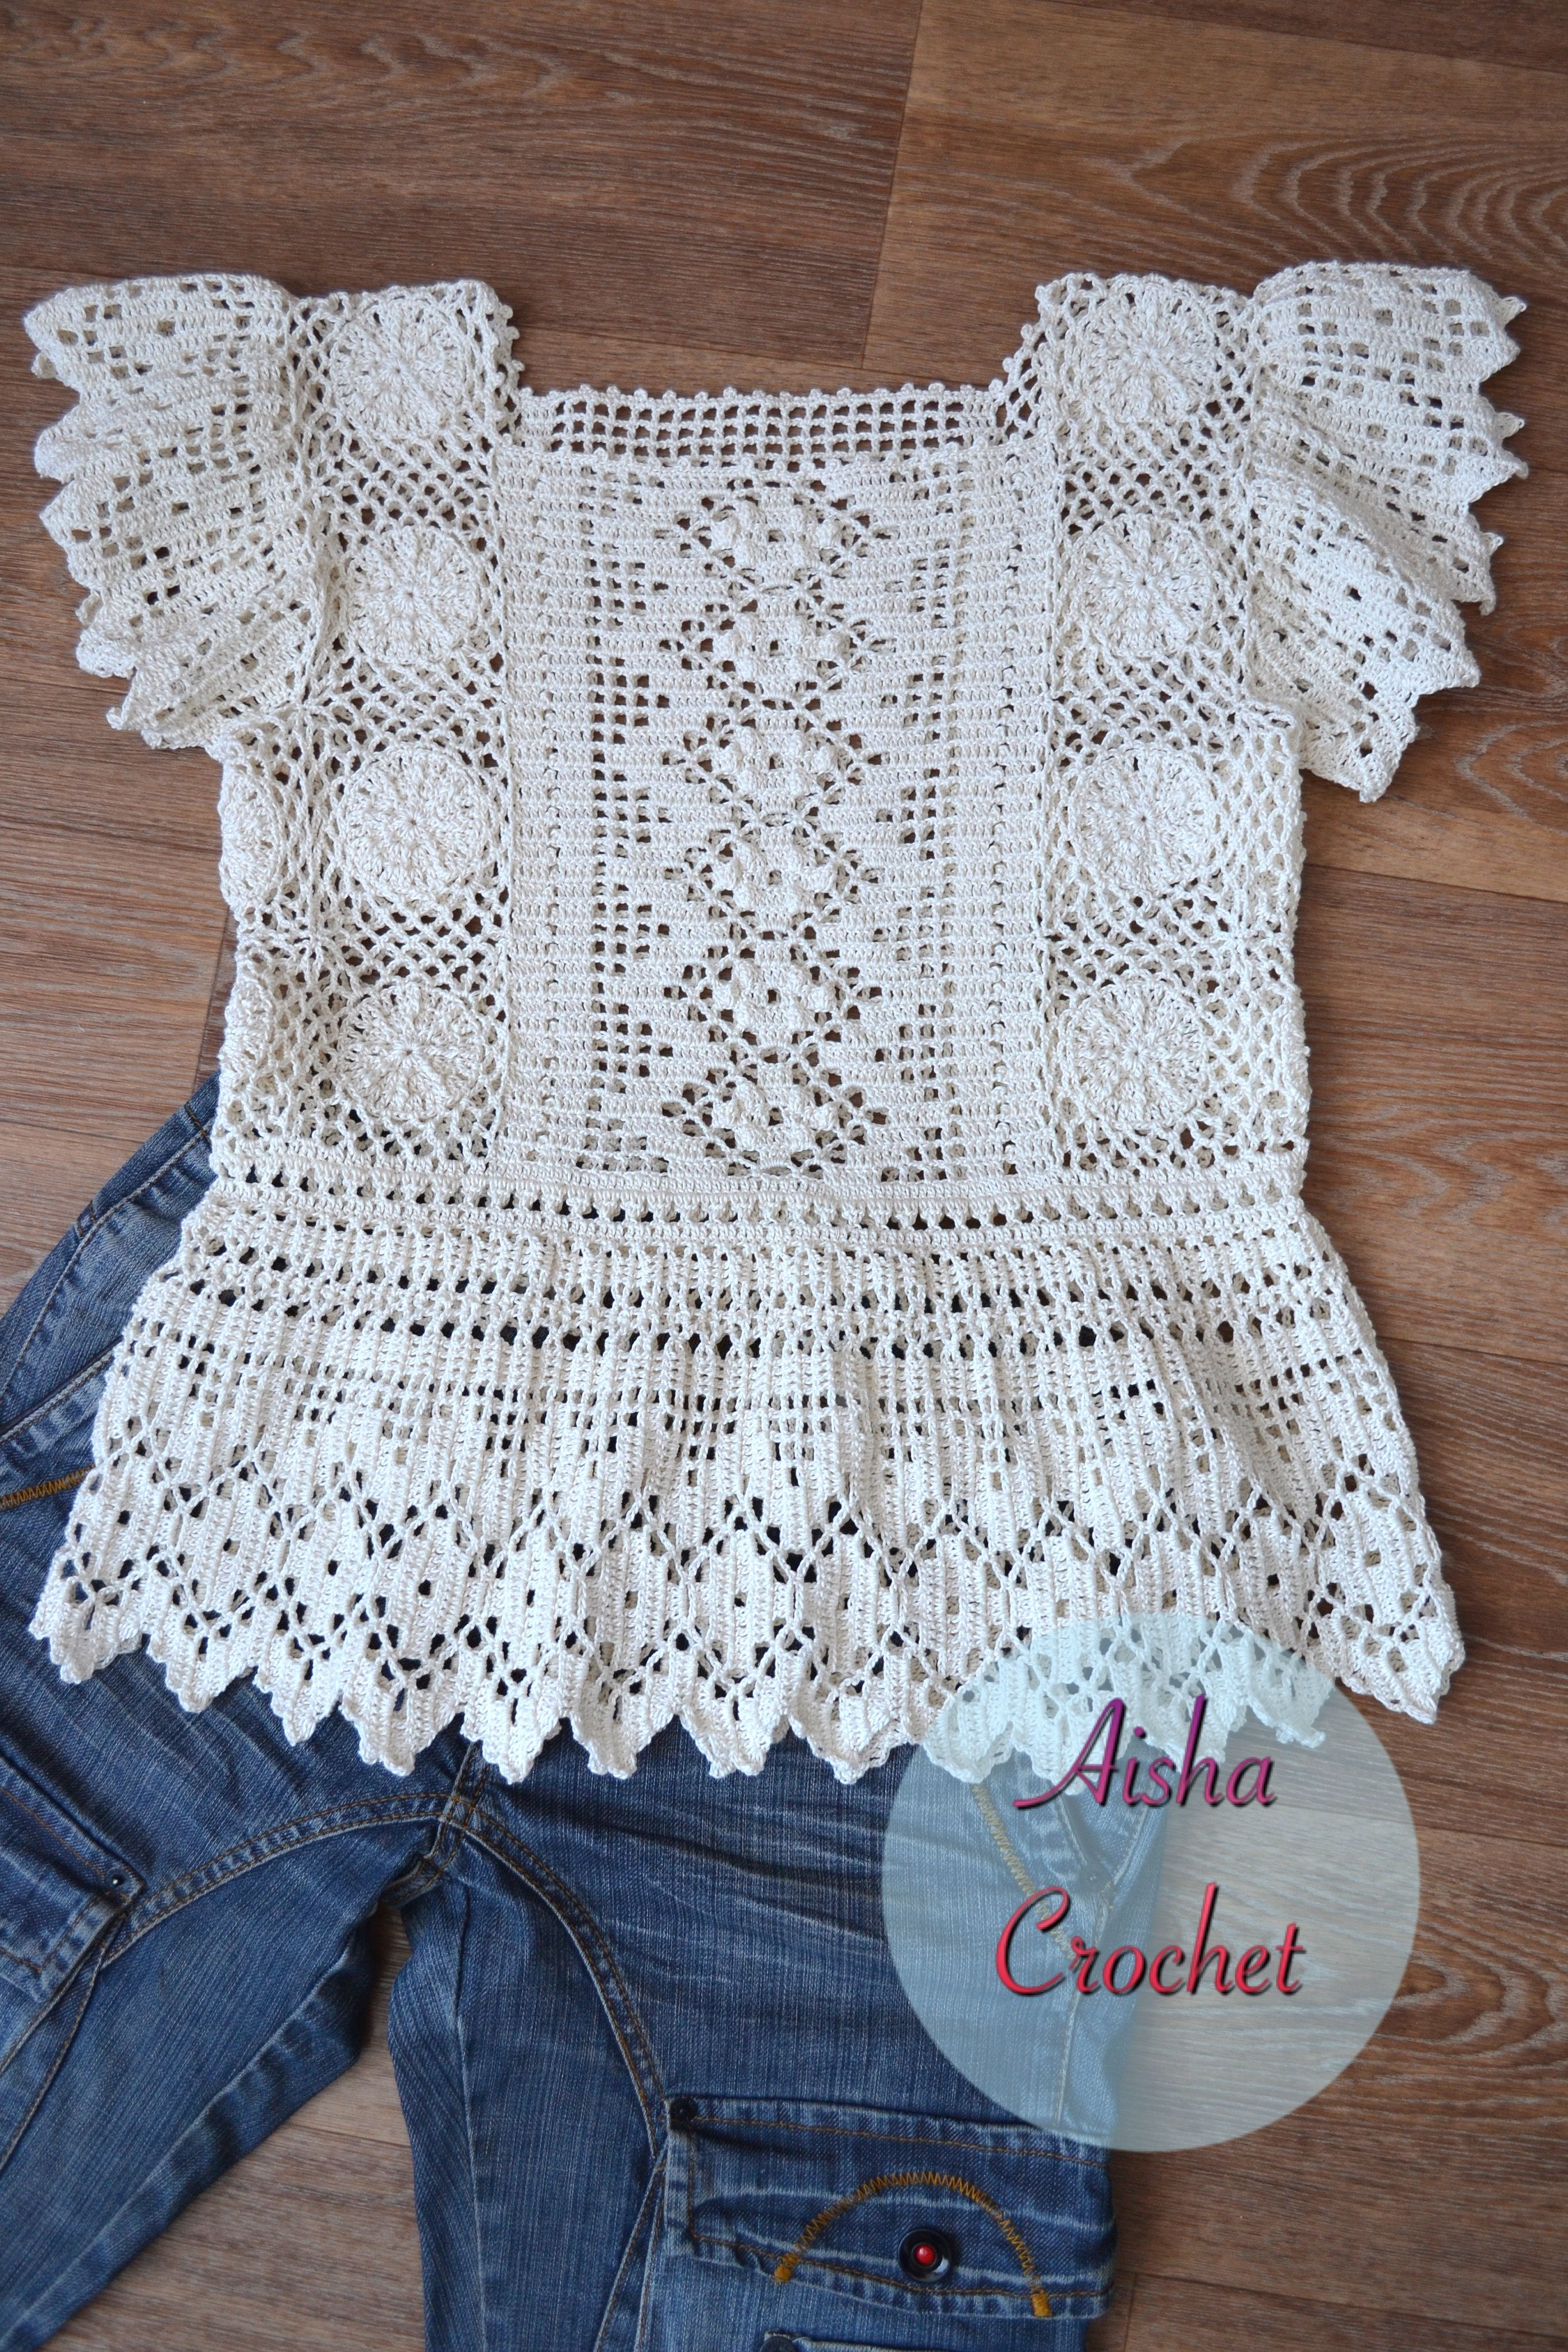 Bohemian crochet by Aisha Crochet